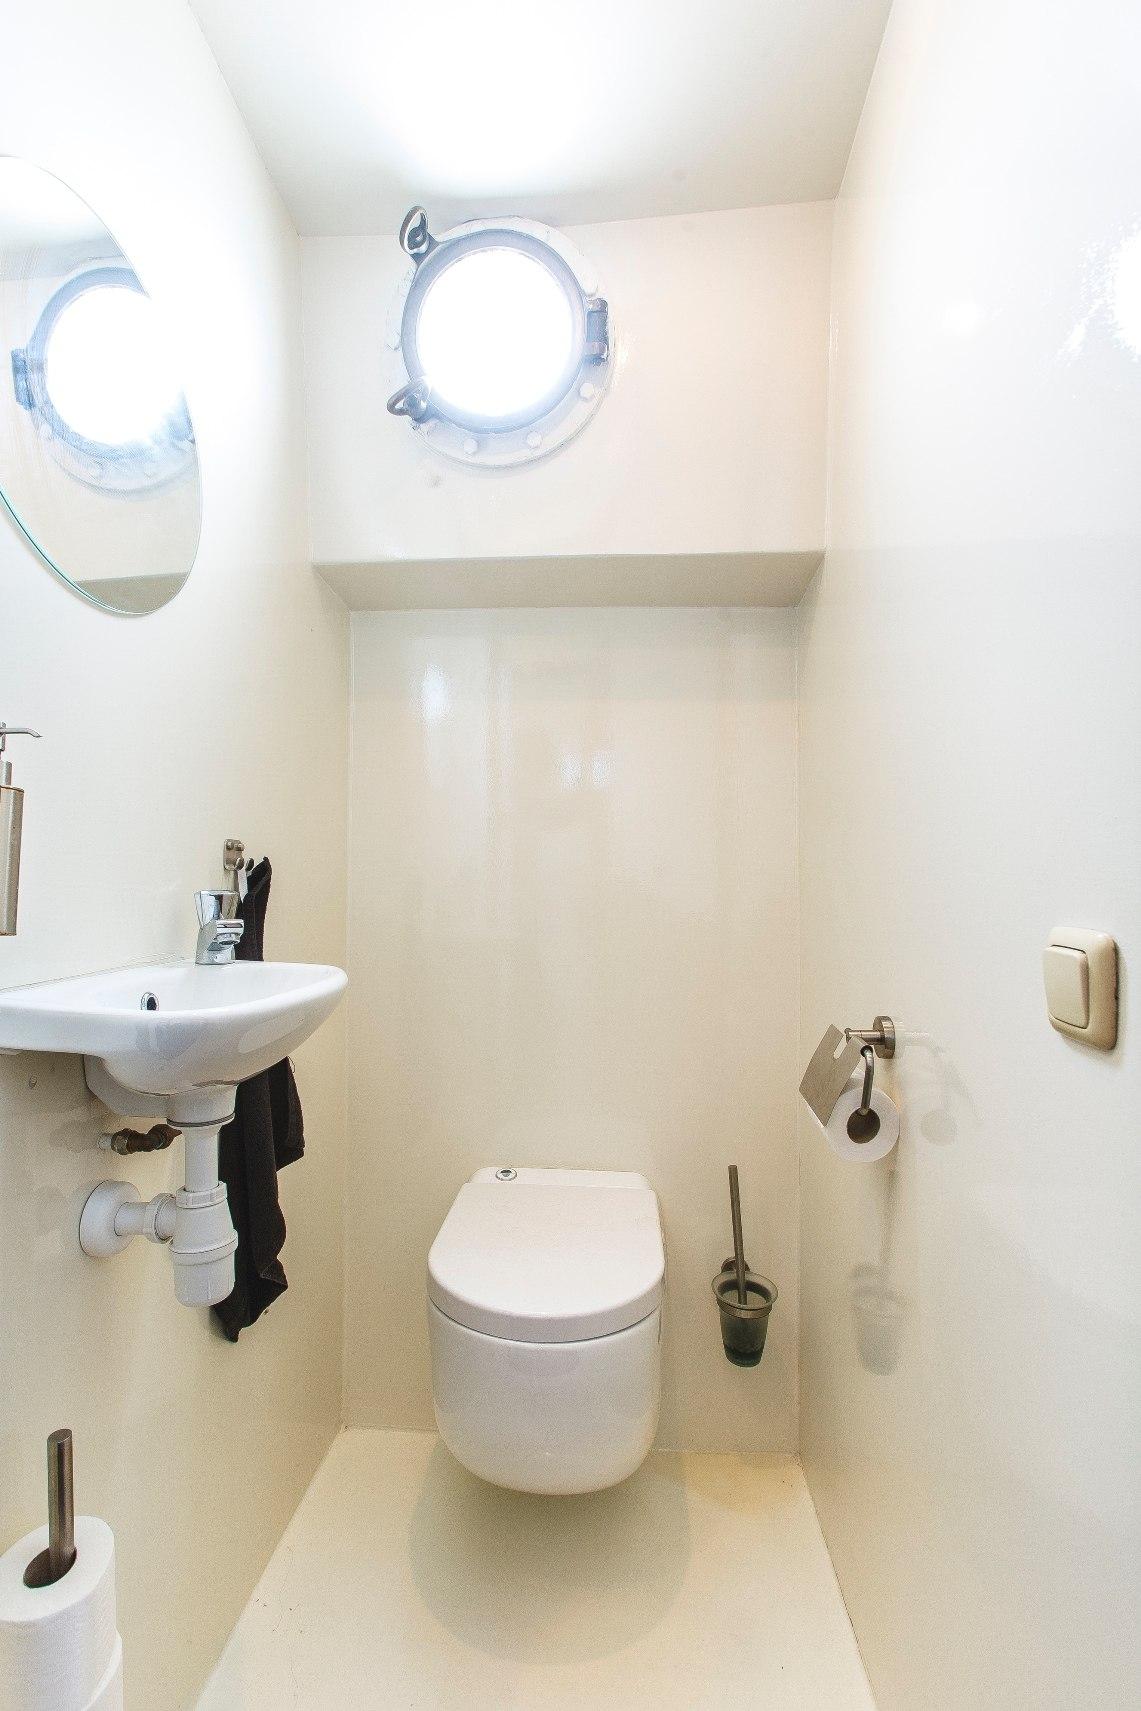 Eersteling_toilet